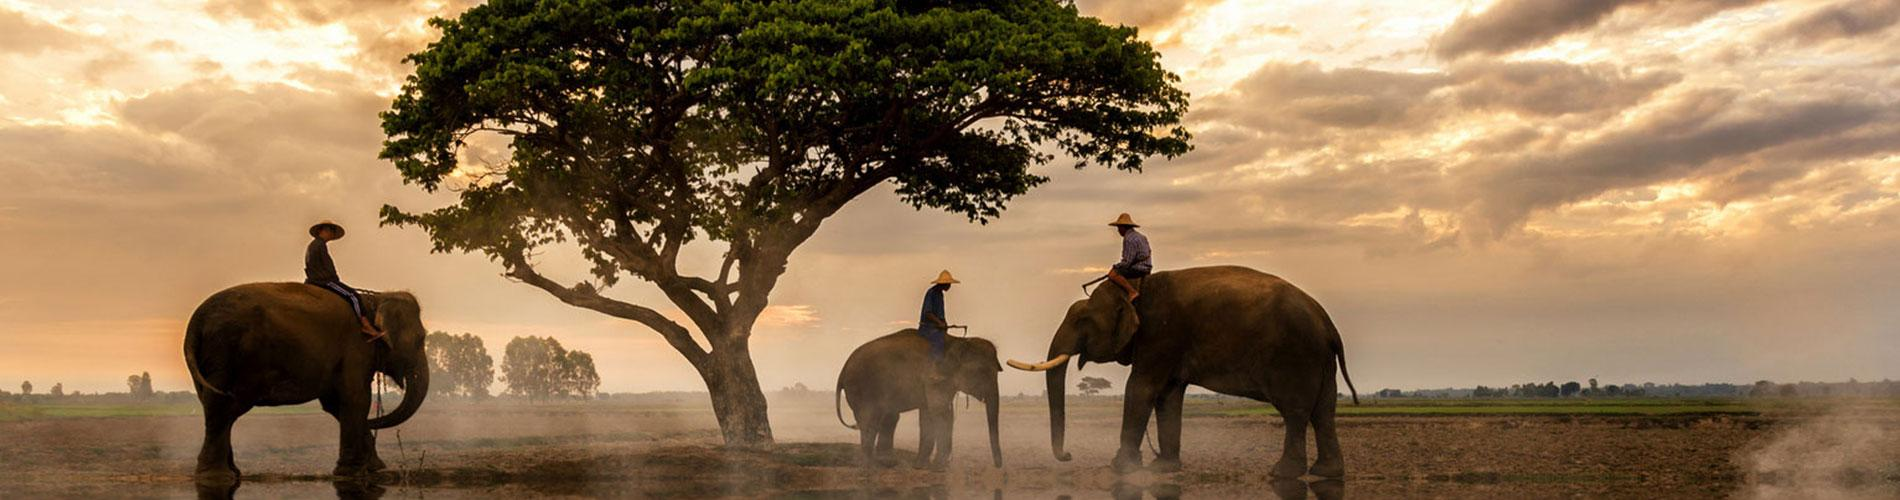 Safari Móvil de Lujo en el Norte de Botswana